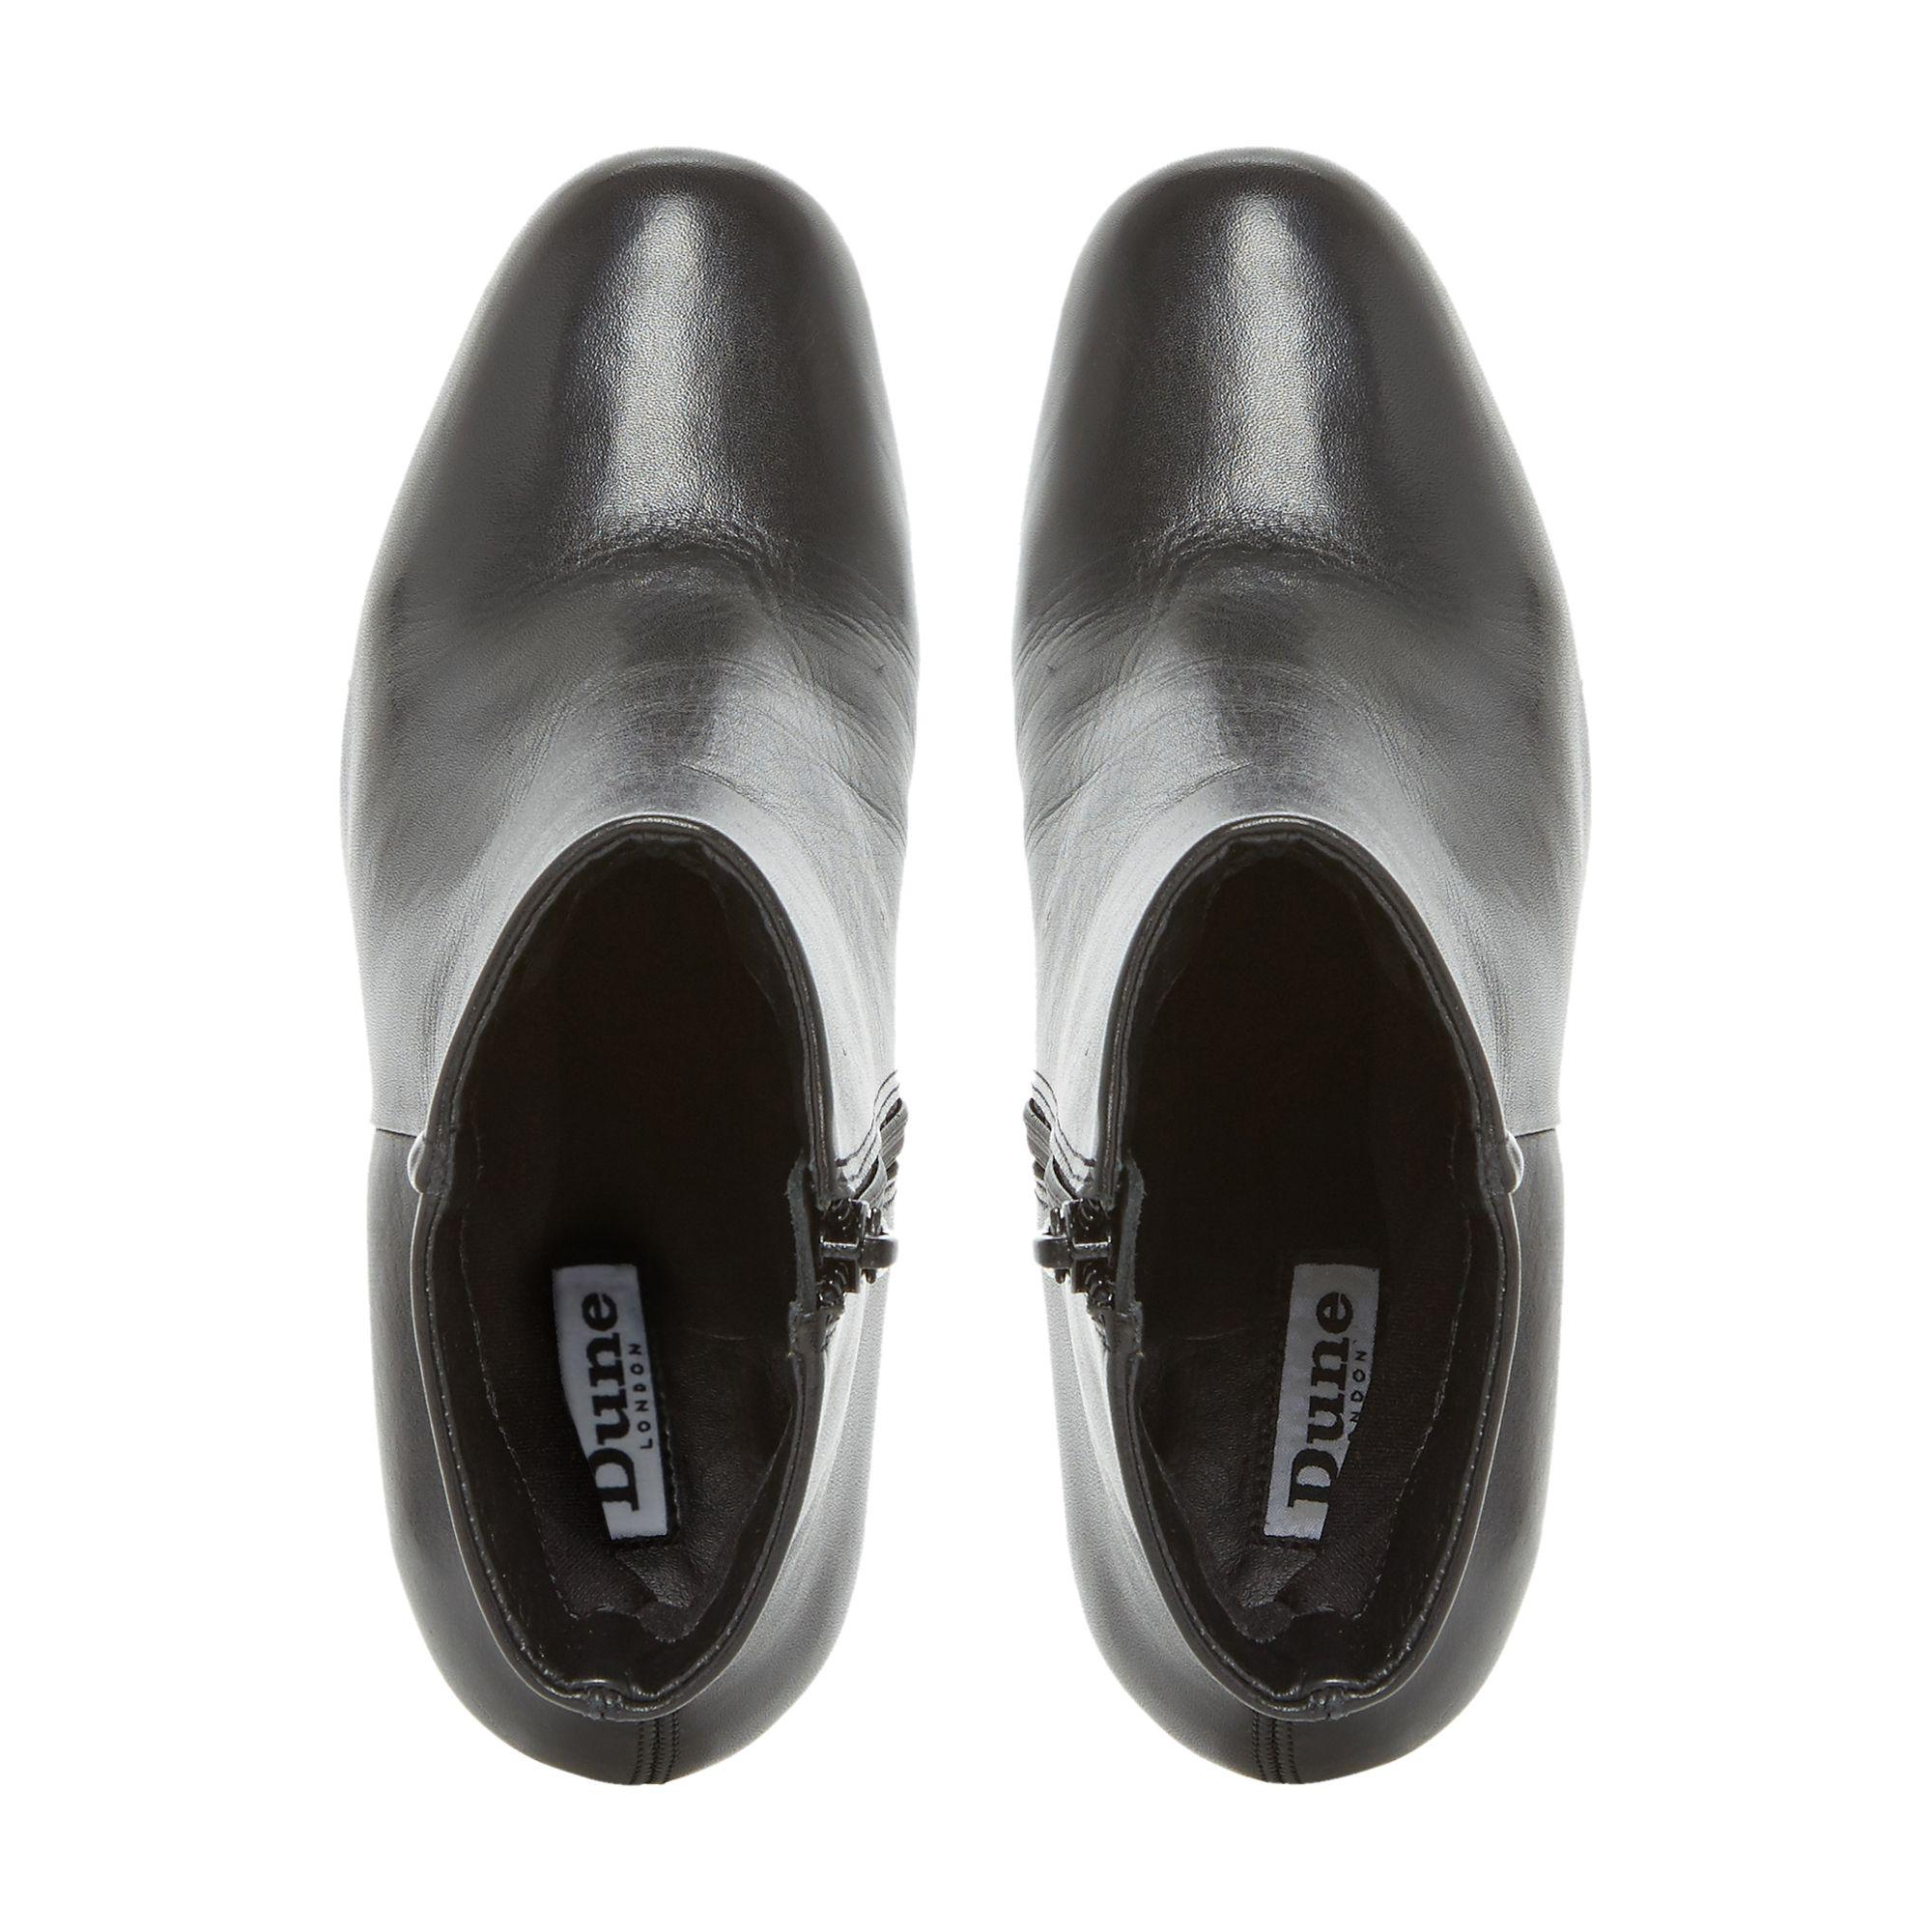 98fca6497d1 Dune Black  osmond  Flared Heel Ankle Boot in Black - Lyst